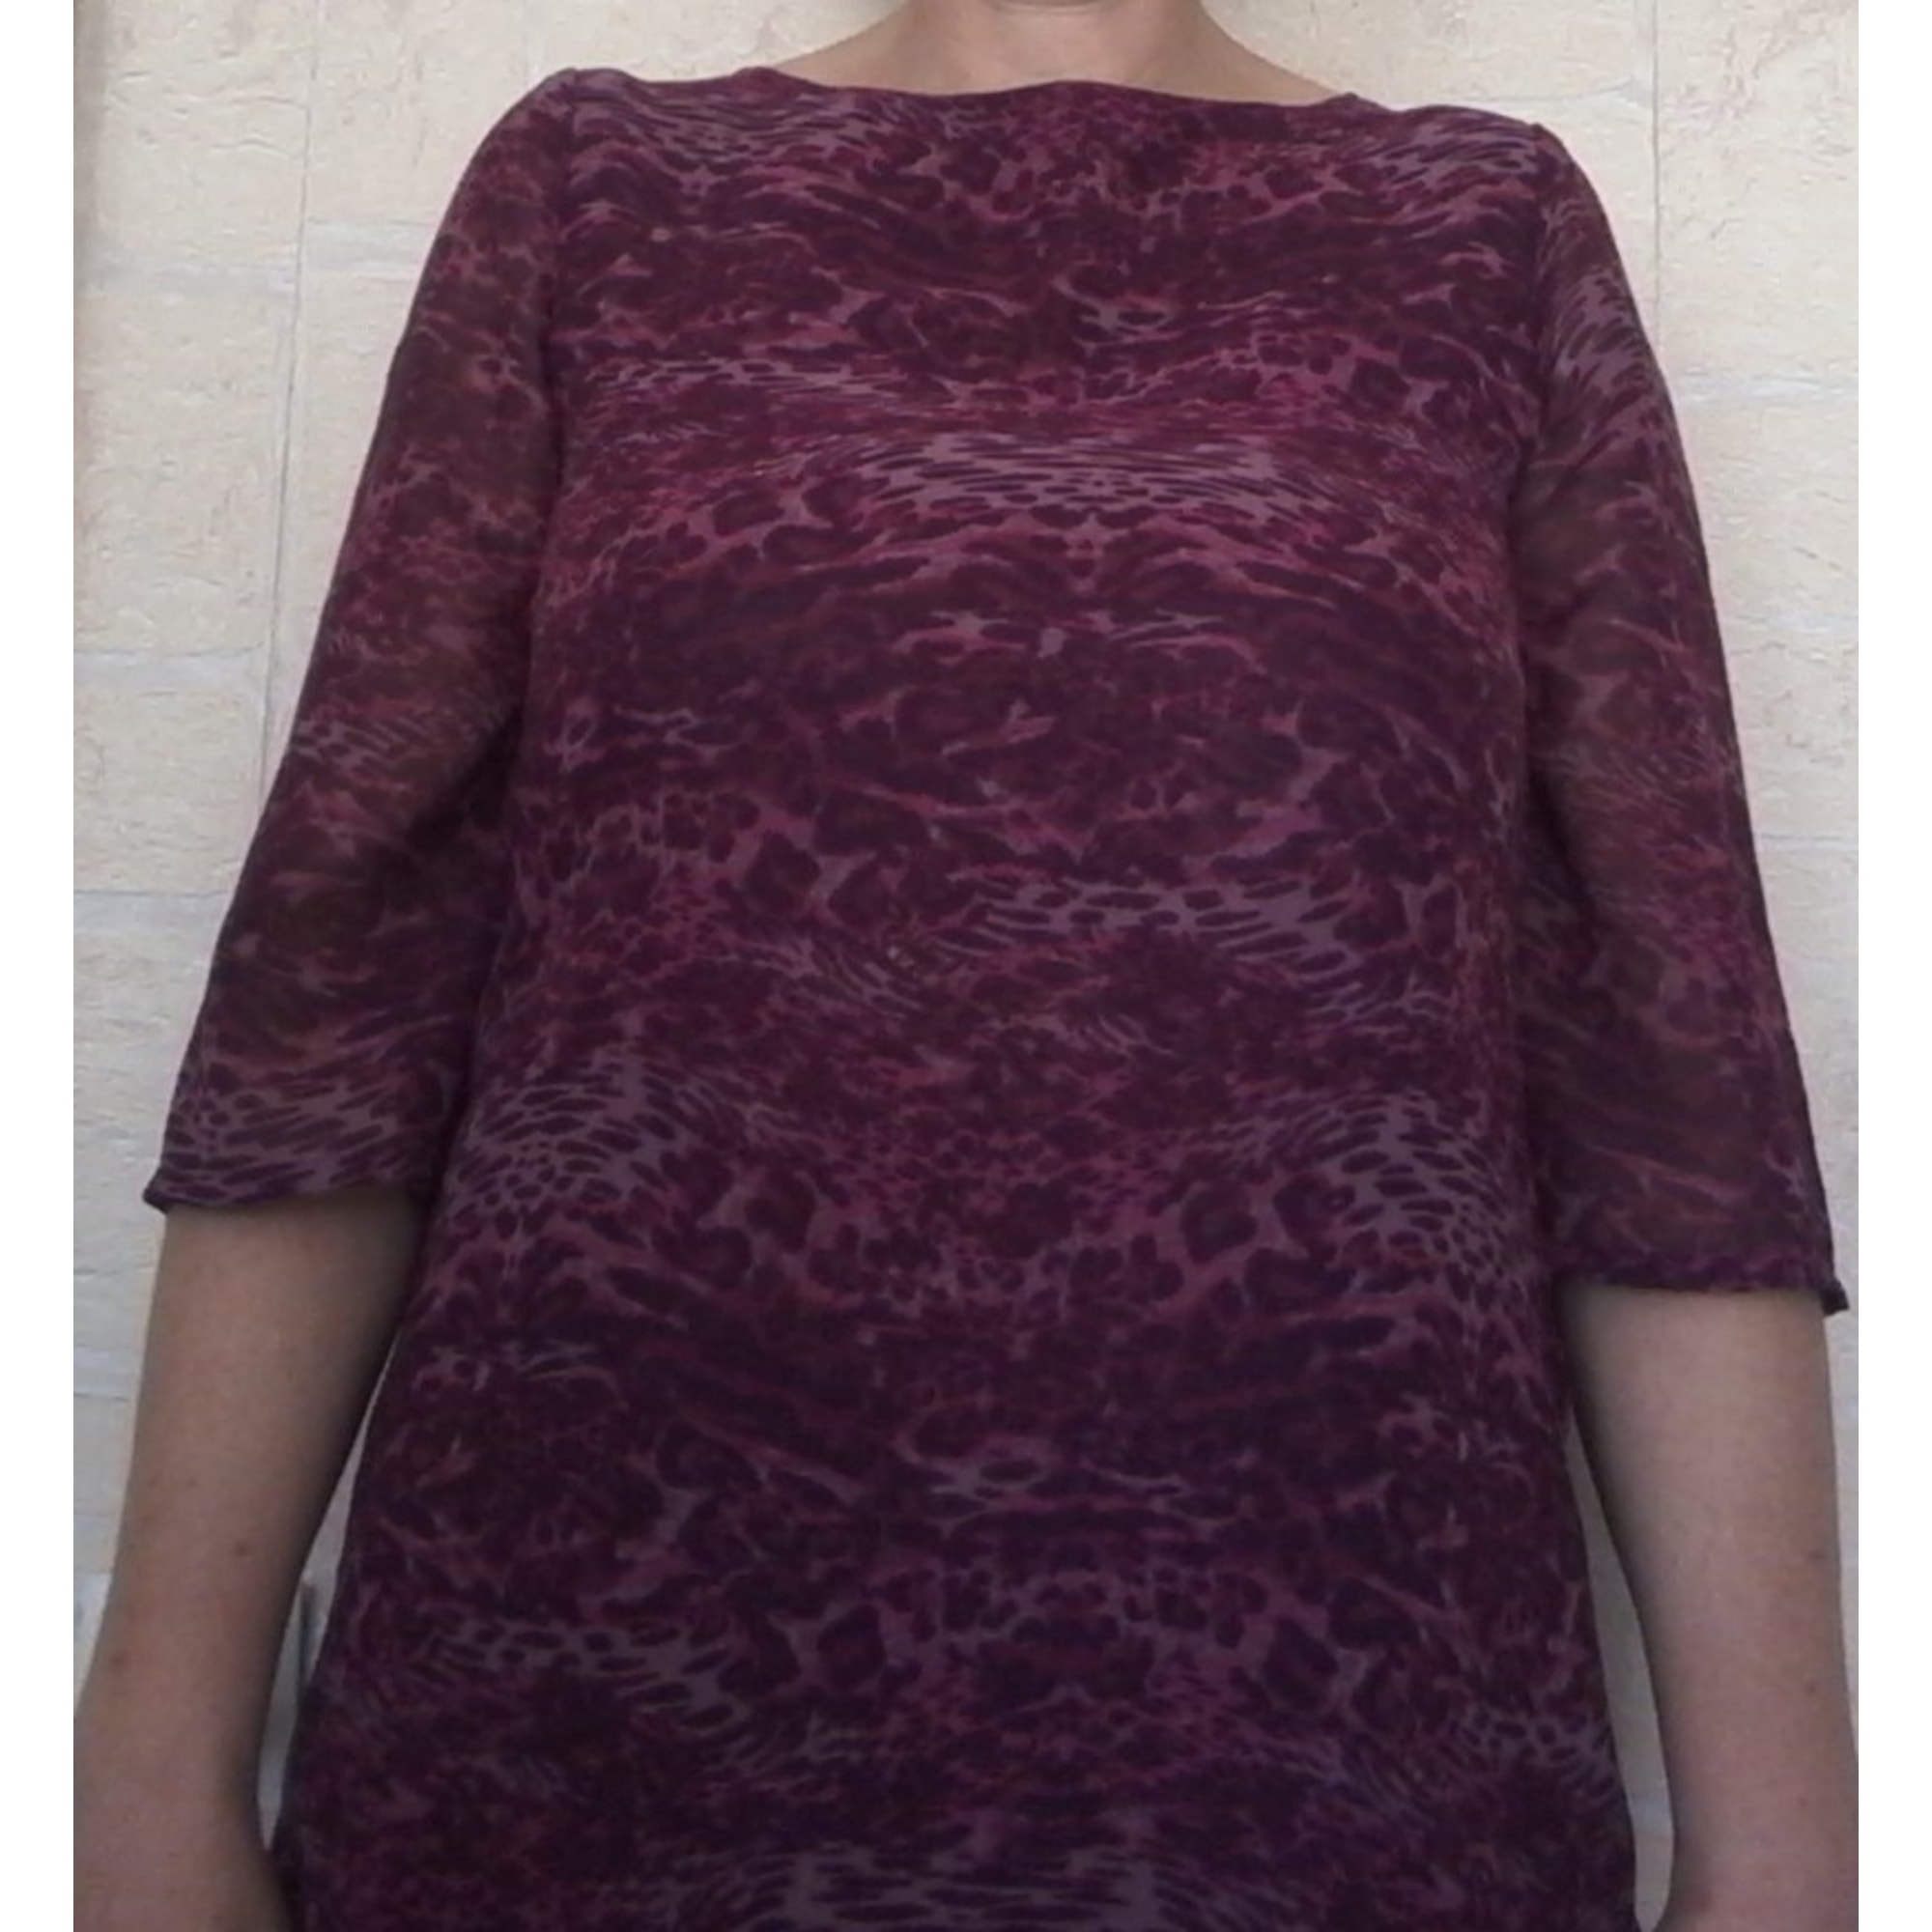 Top, tee-shirt KIABI Violet, mauve, lavande